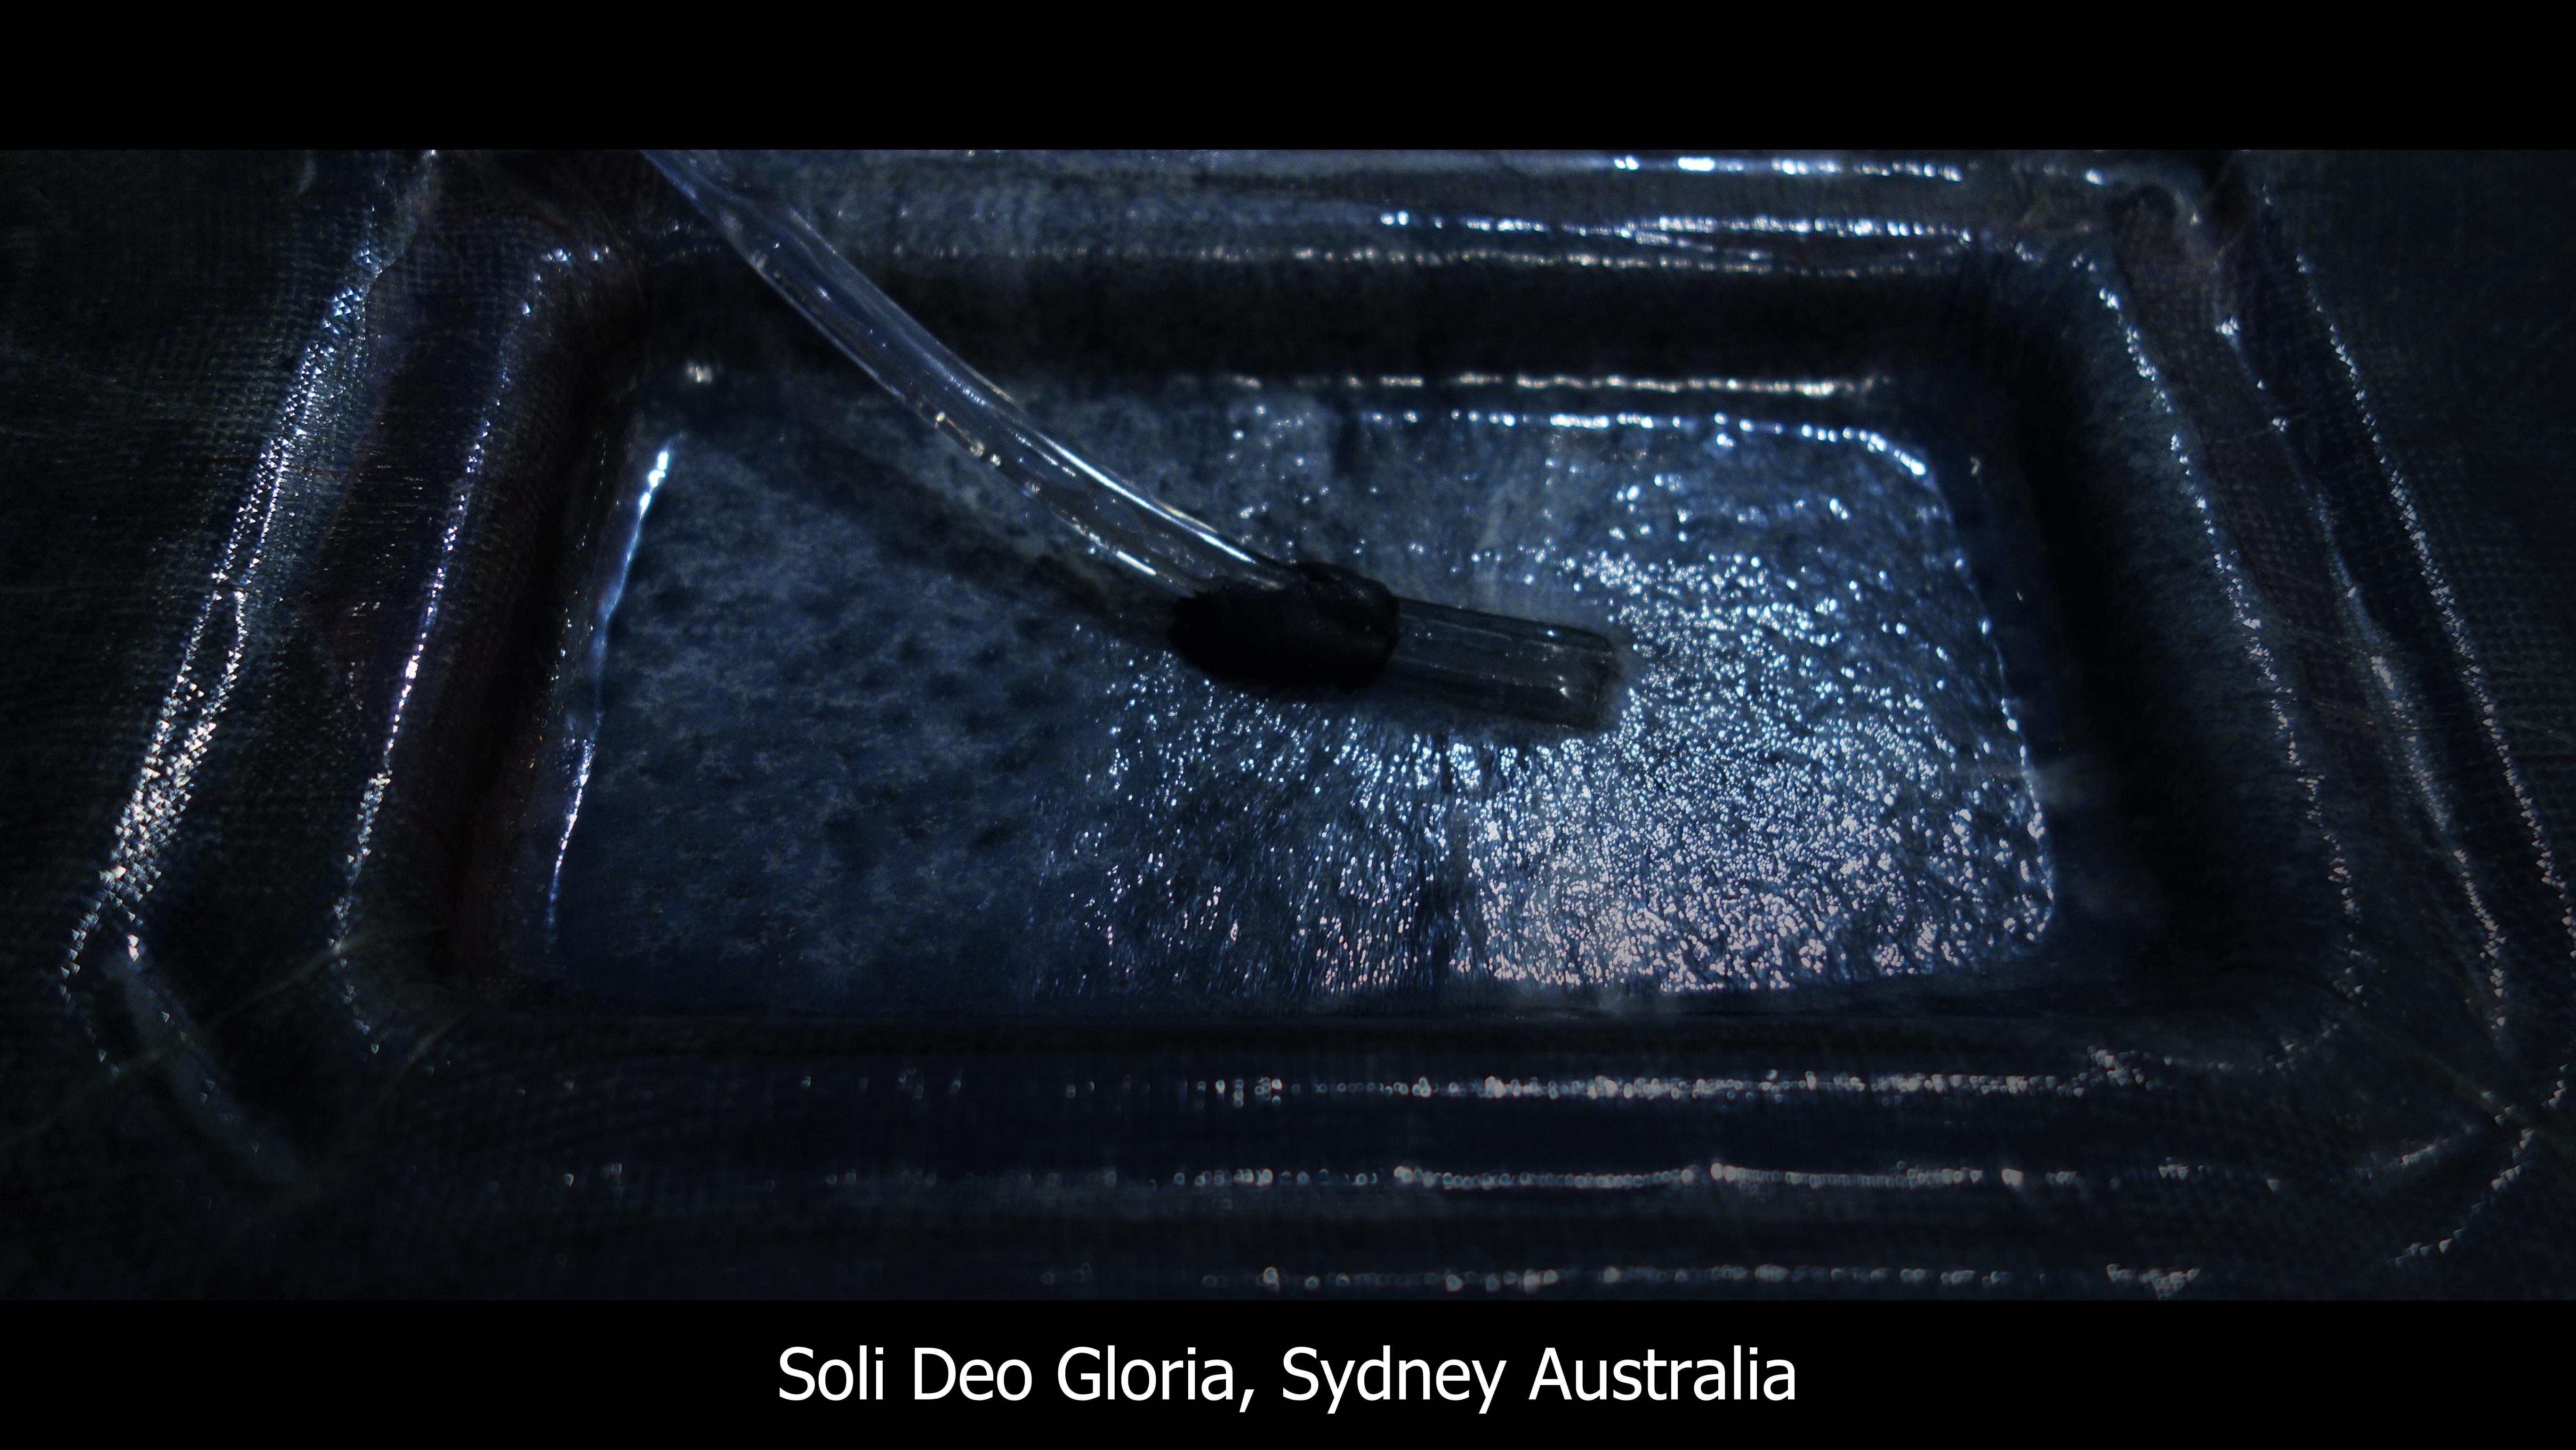 Solideogloria-Modular-Battery-Enclosure-Black-Smoke-Fibreglass-4